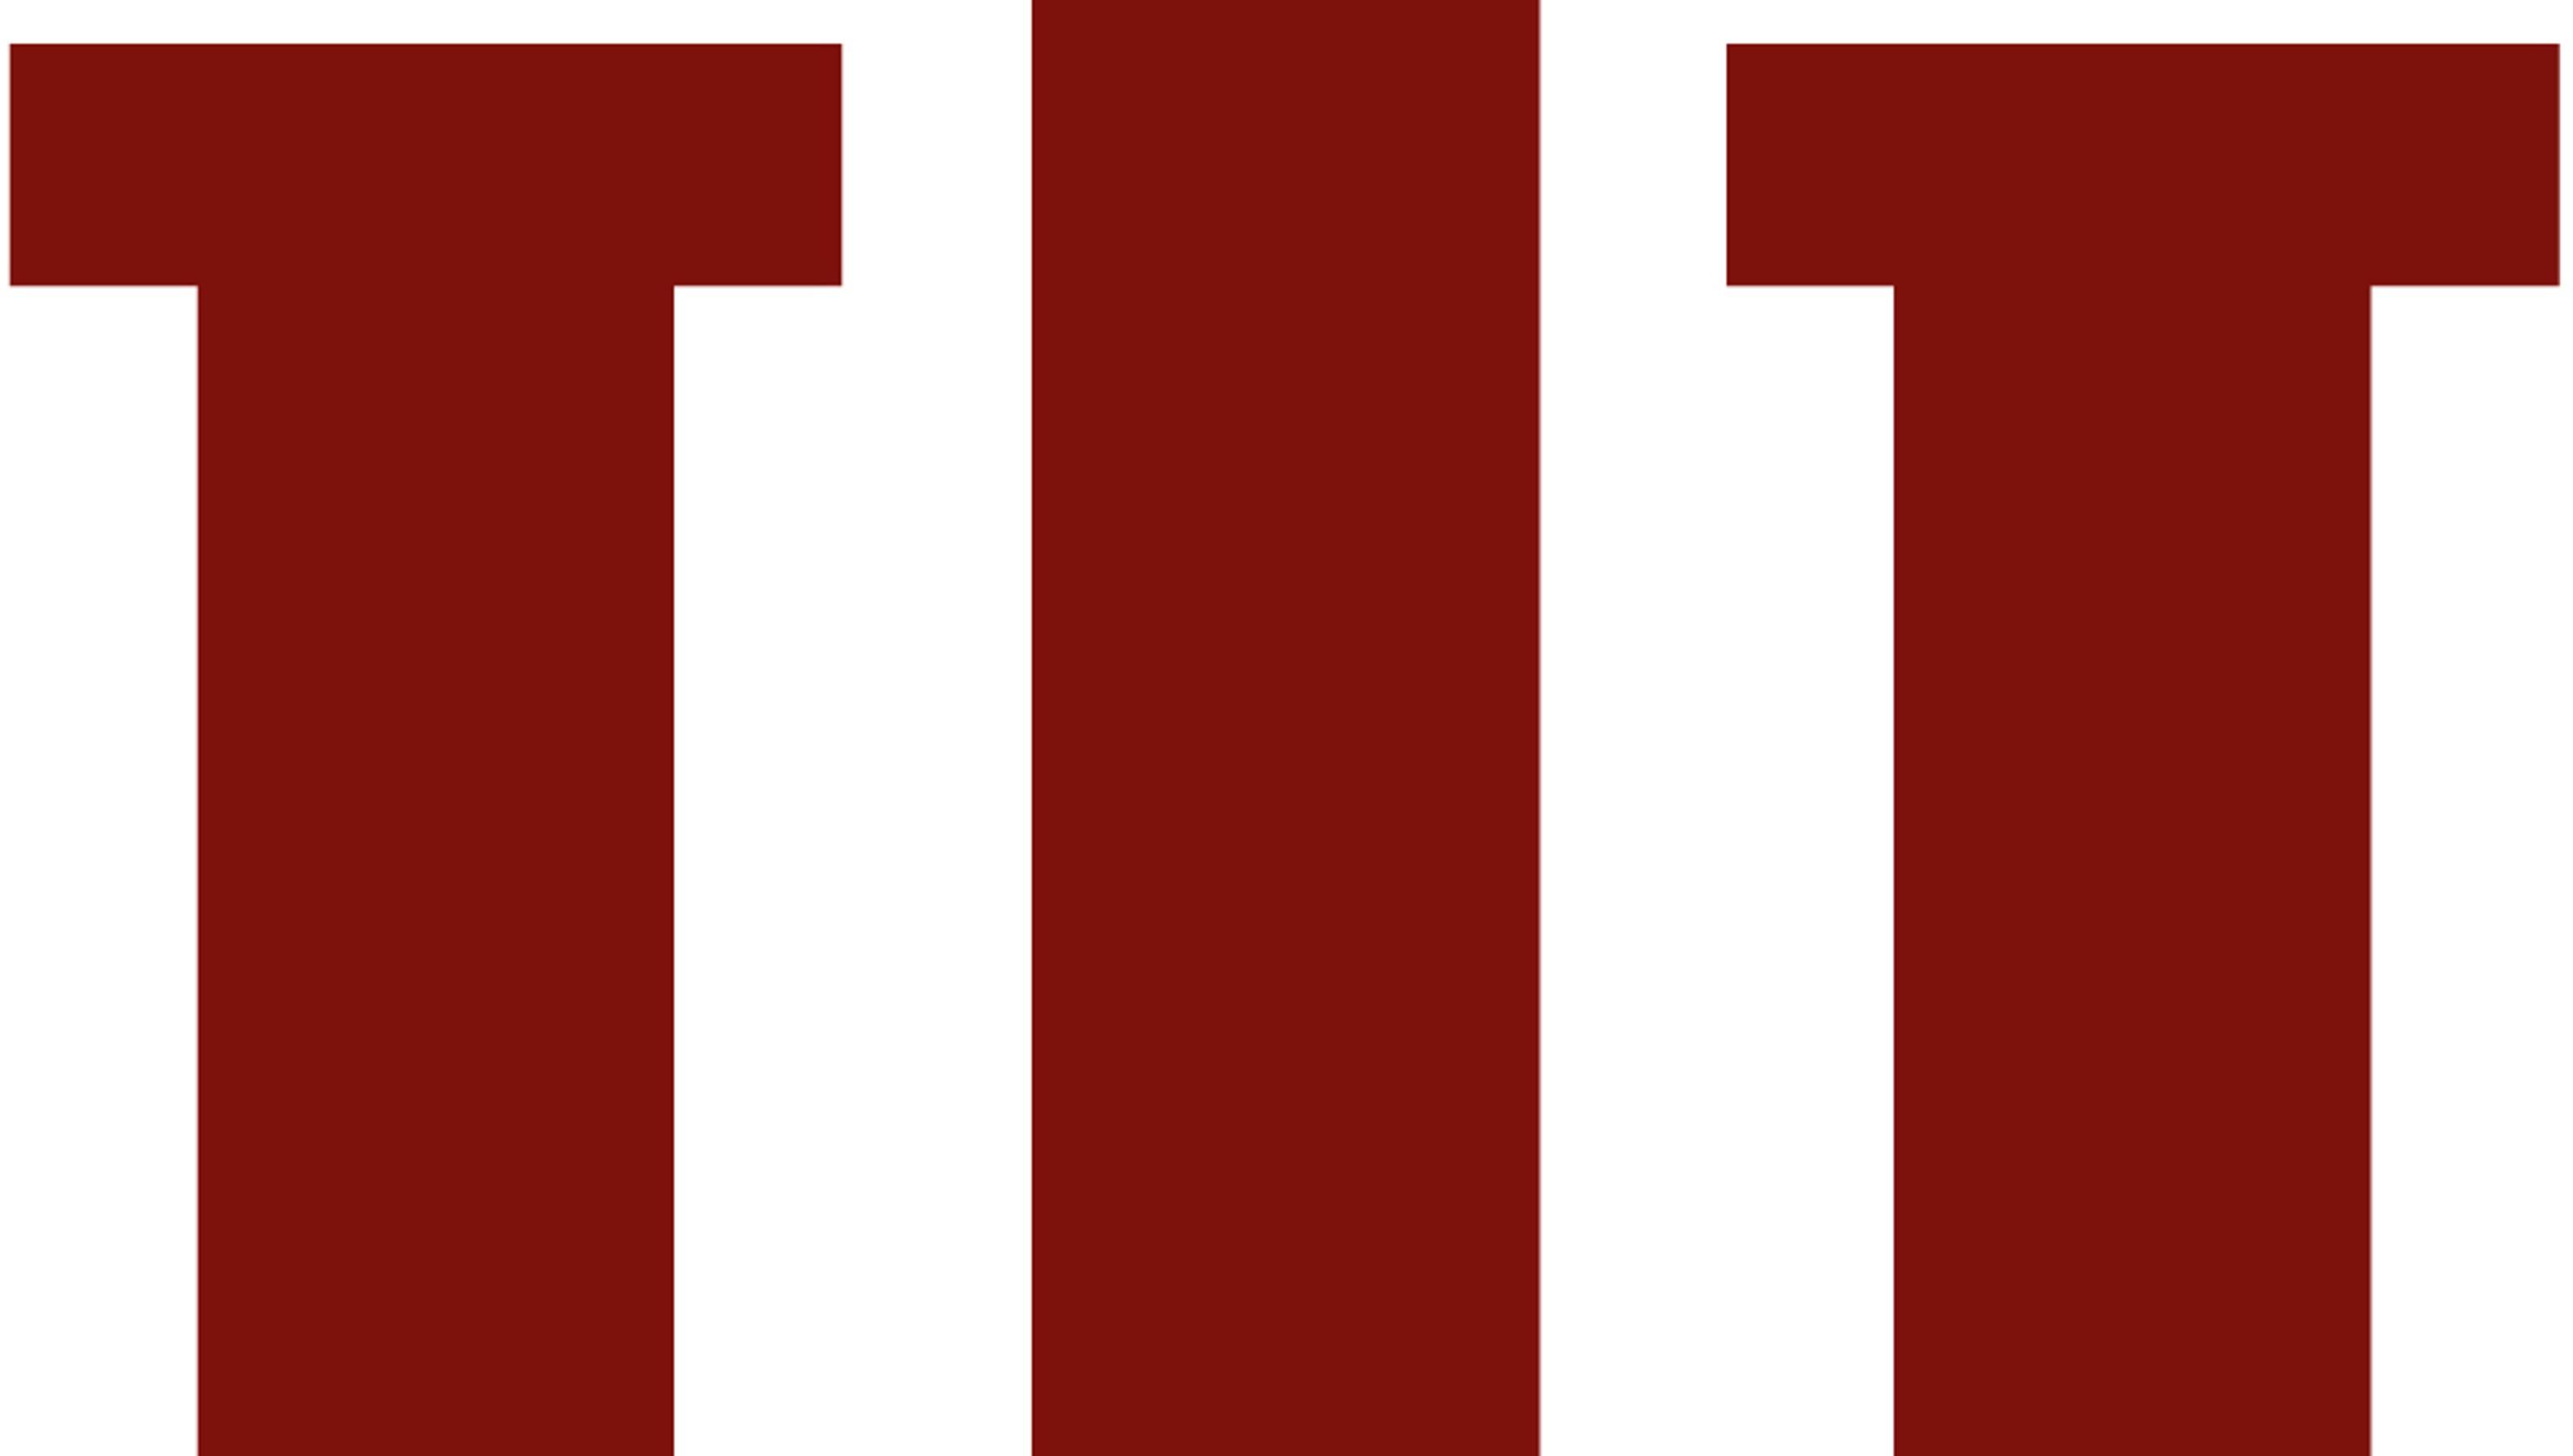 Iu Purdue Basketball Score | Basketball Scores